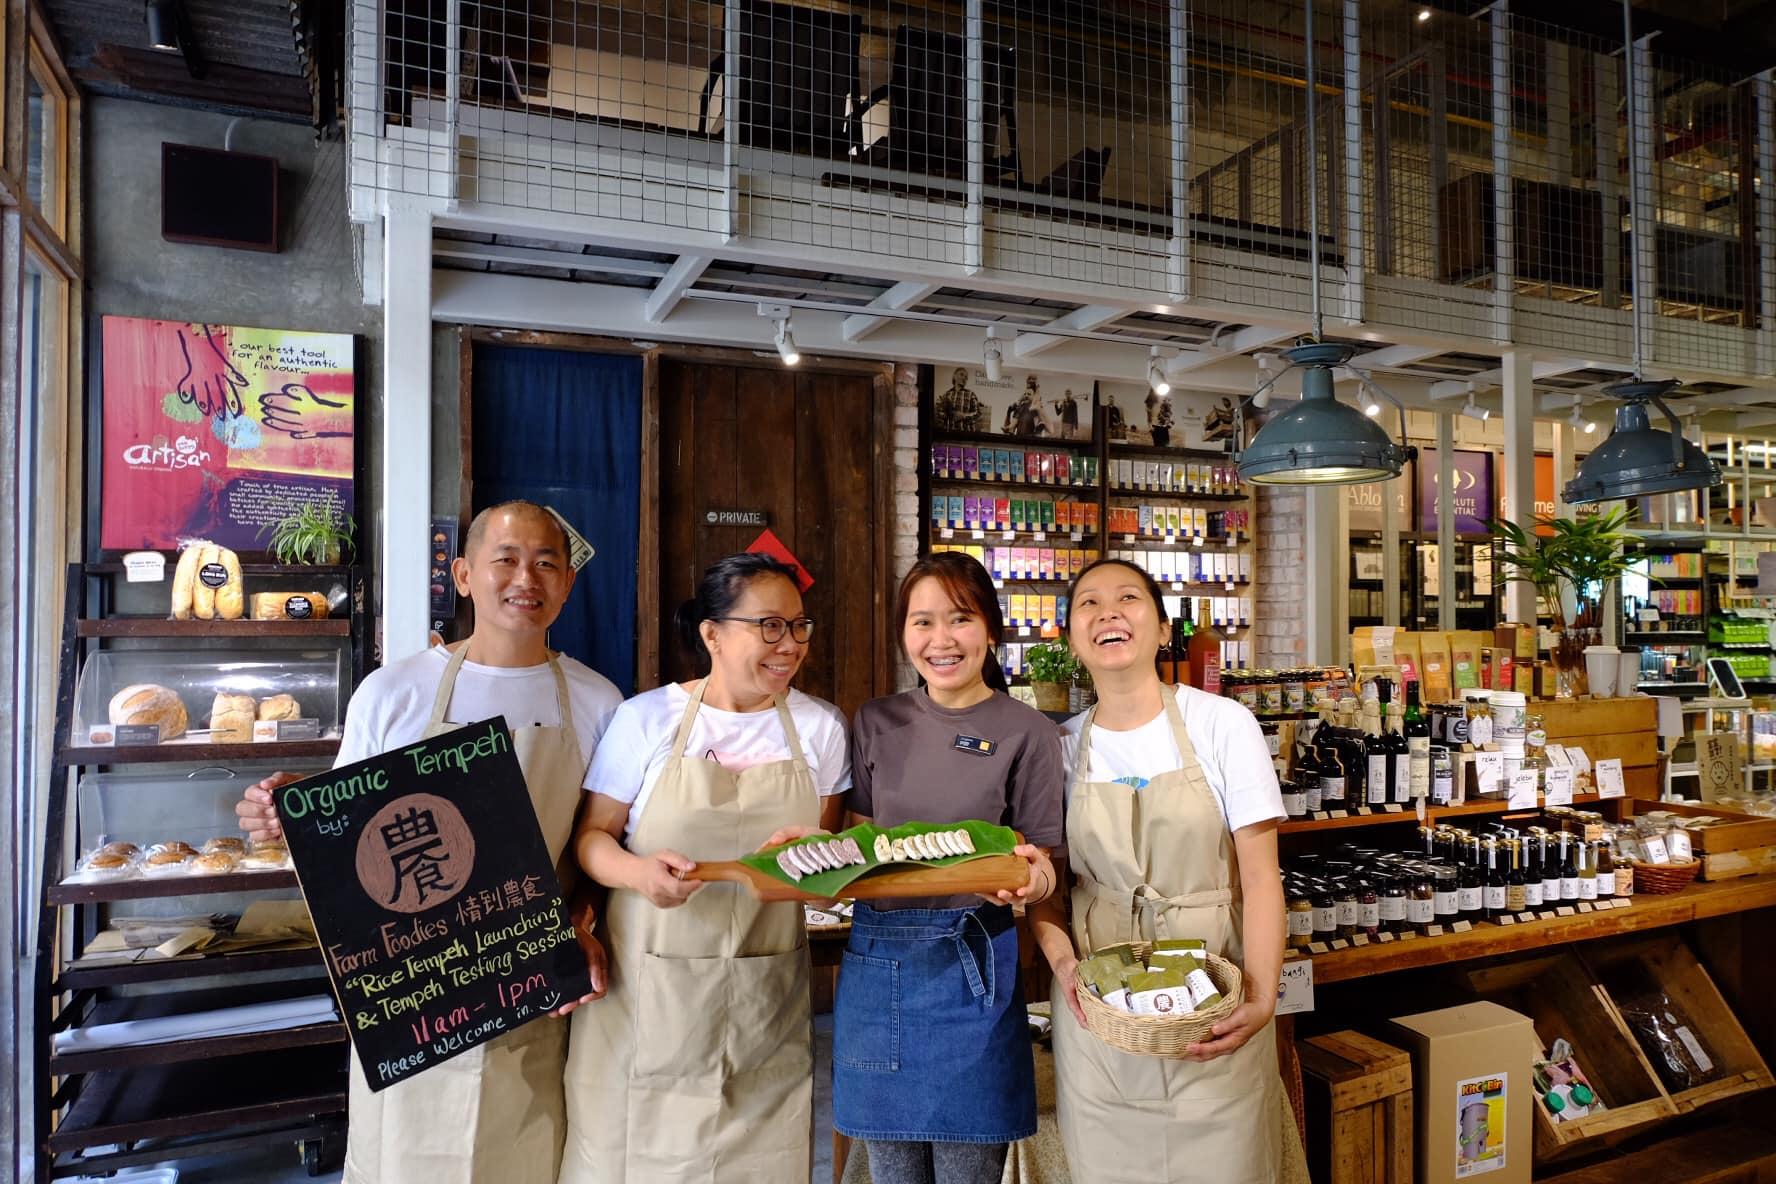 justlife organic shops in klang valley